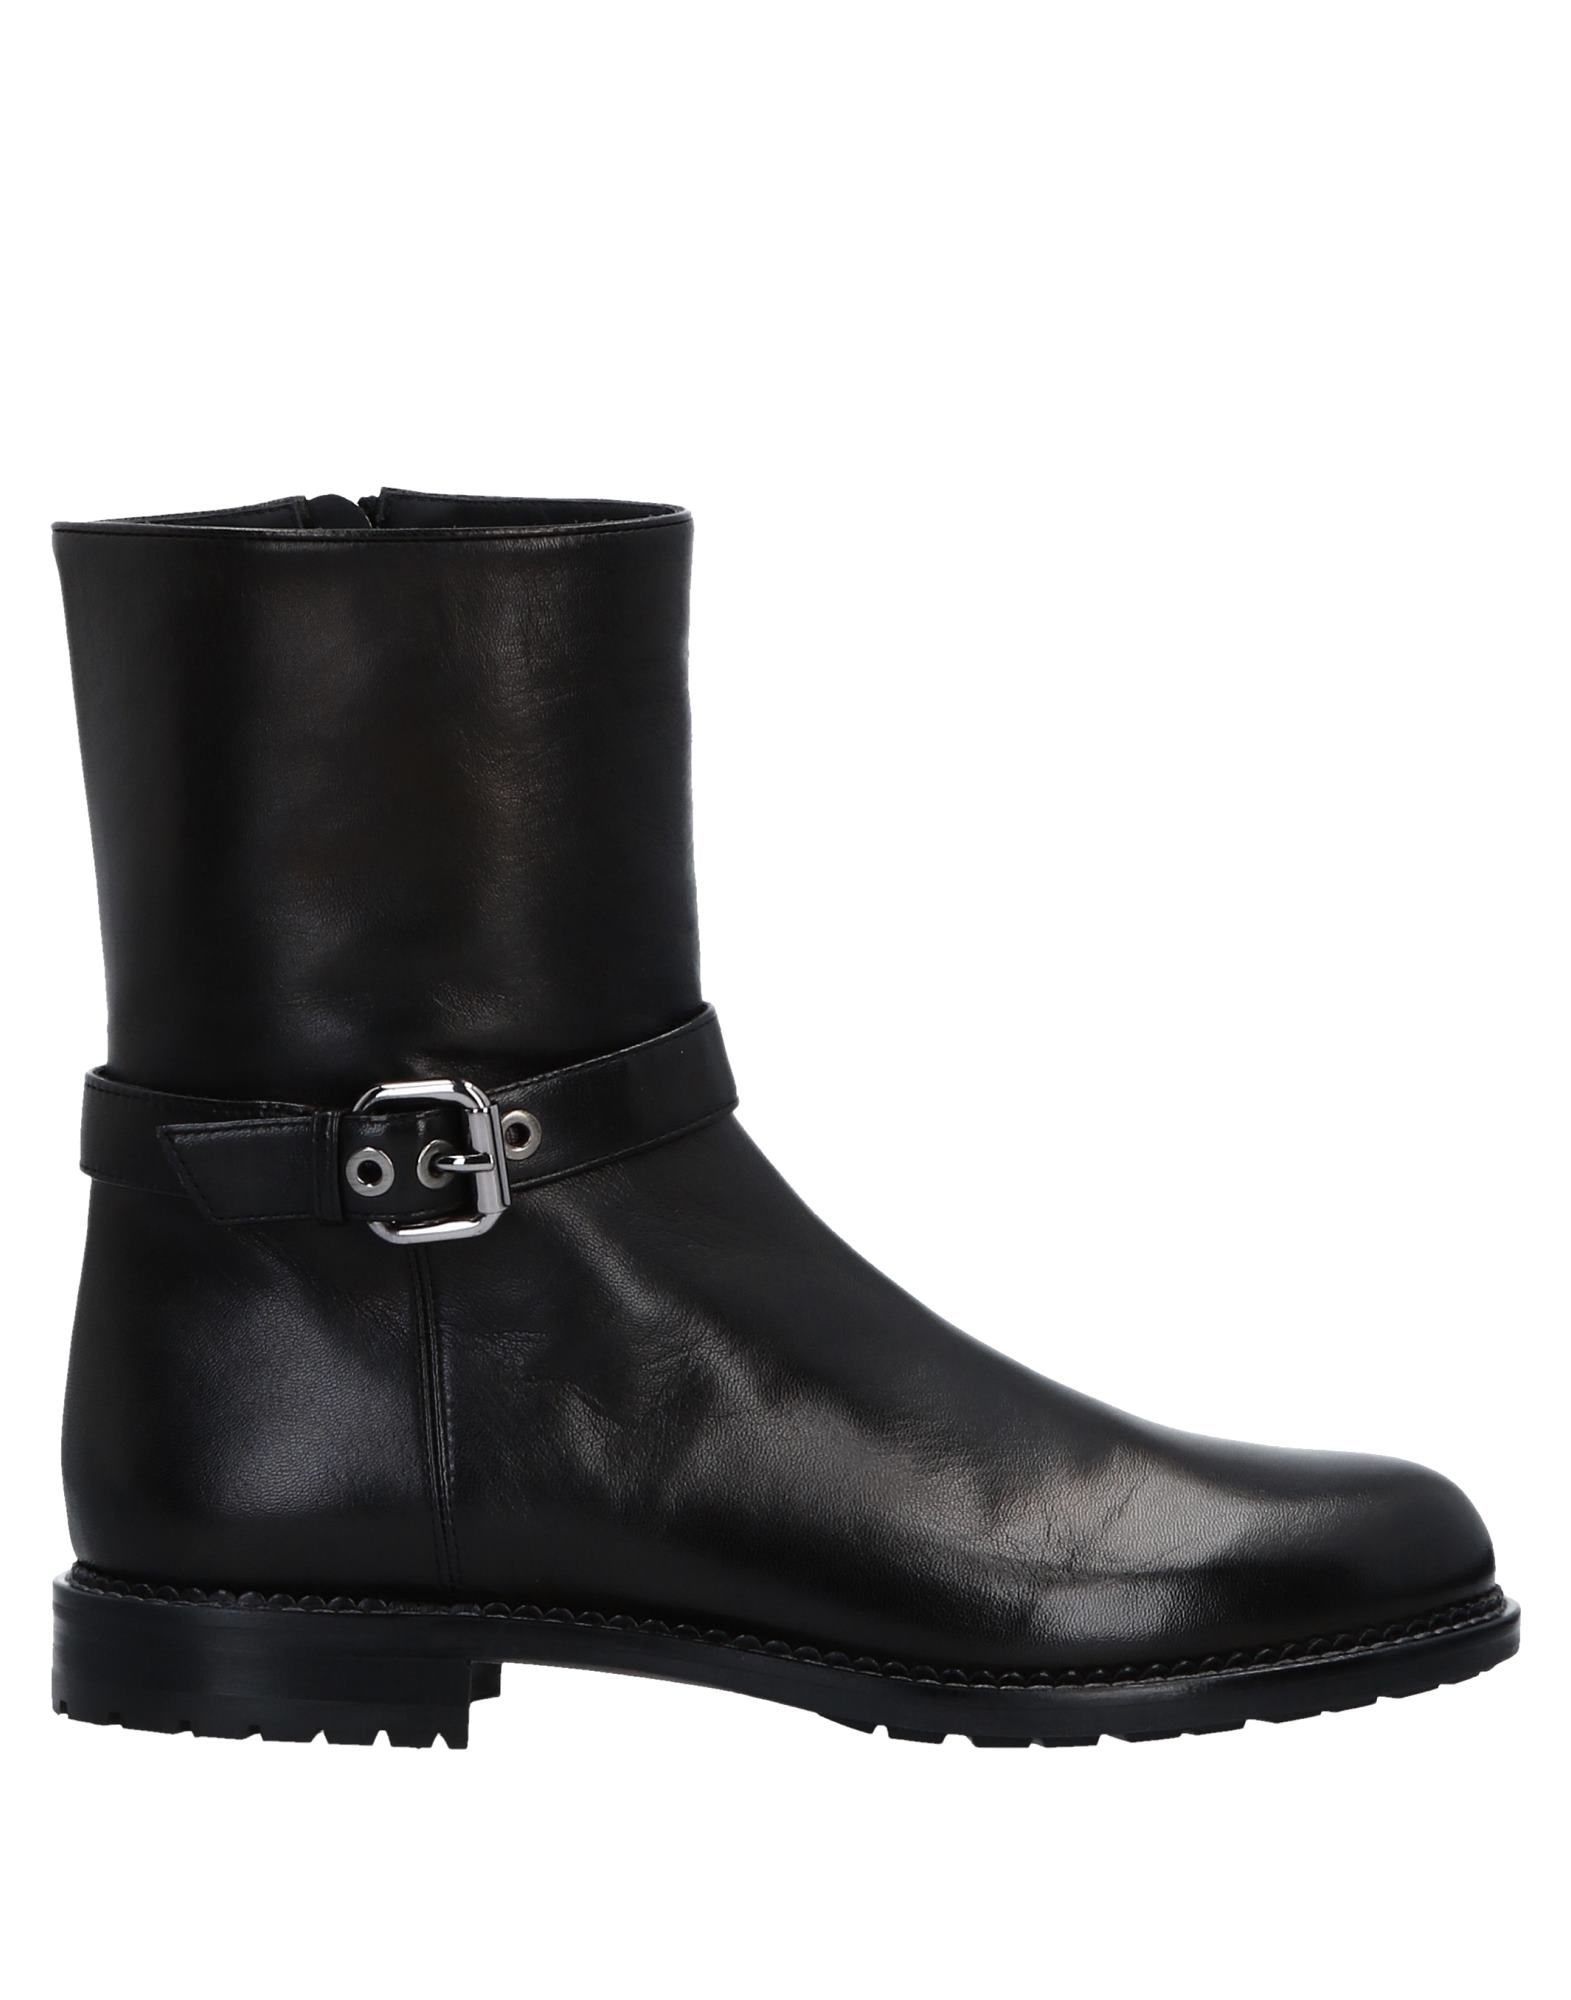 Rabatt  Schuhe Loriblu Stiefelette Damen  Rabatt 11516416JJ 178557